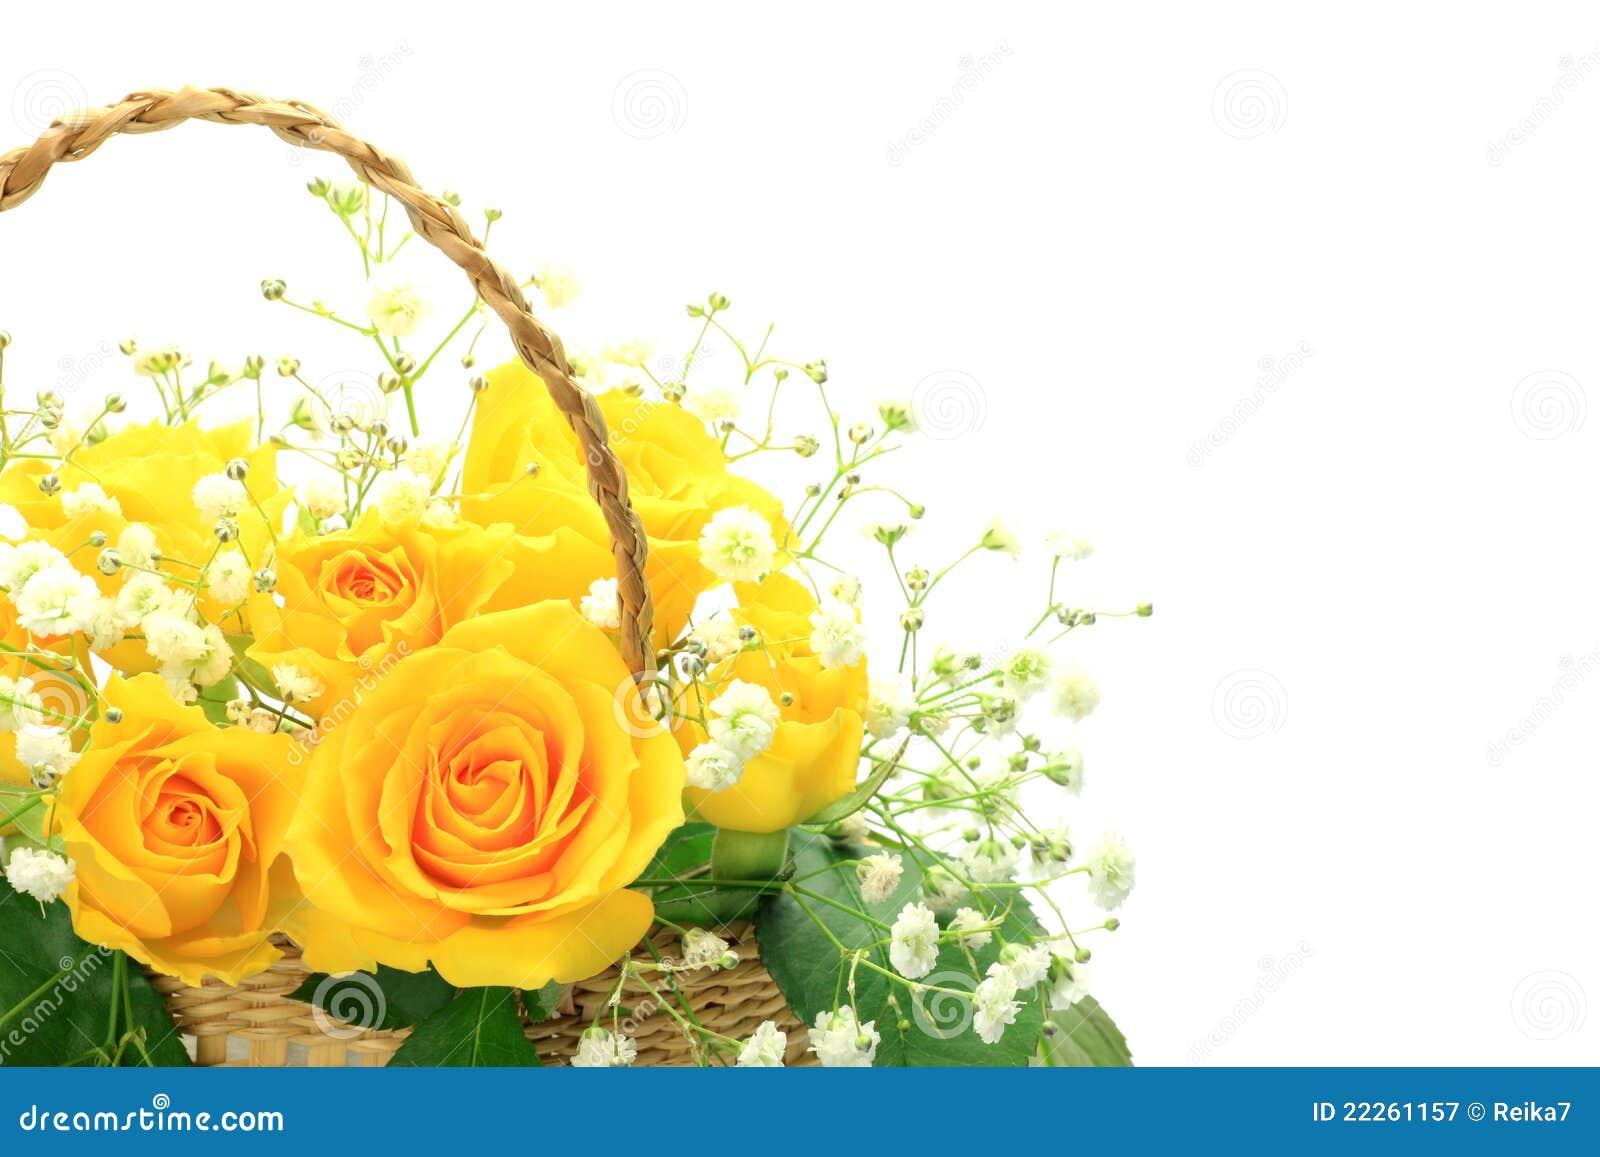 Yellow Rose Stock Image Image Of Father Basket White 22261157